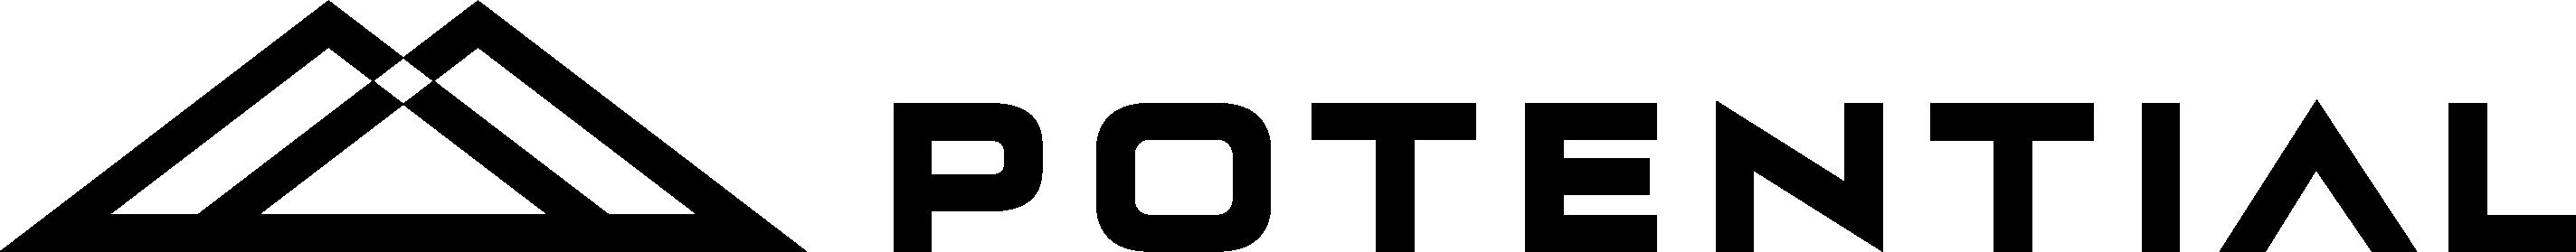 Potential Motors logo black